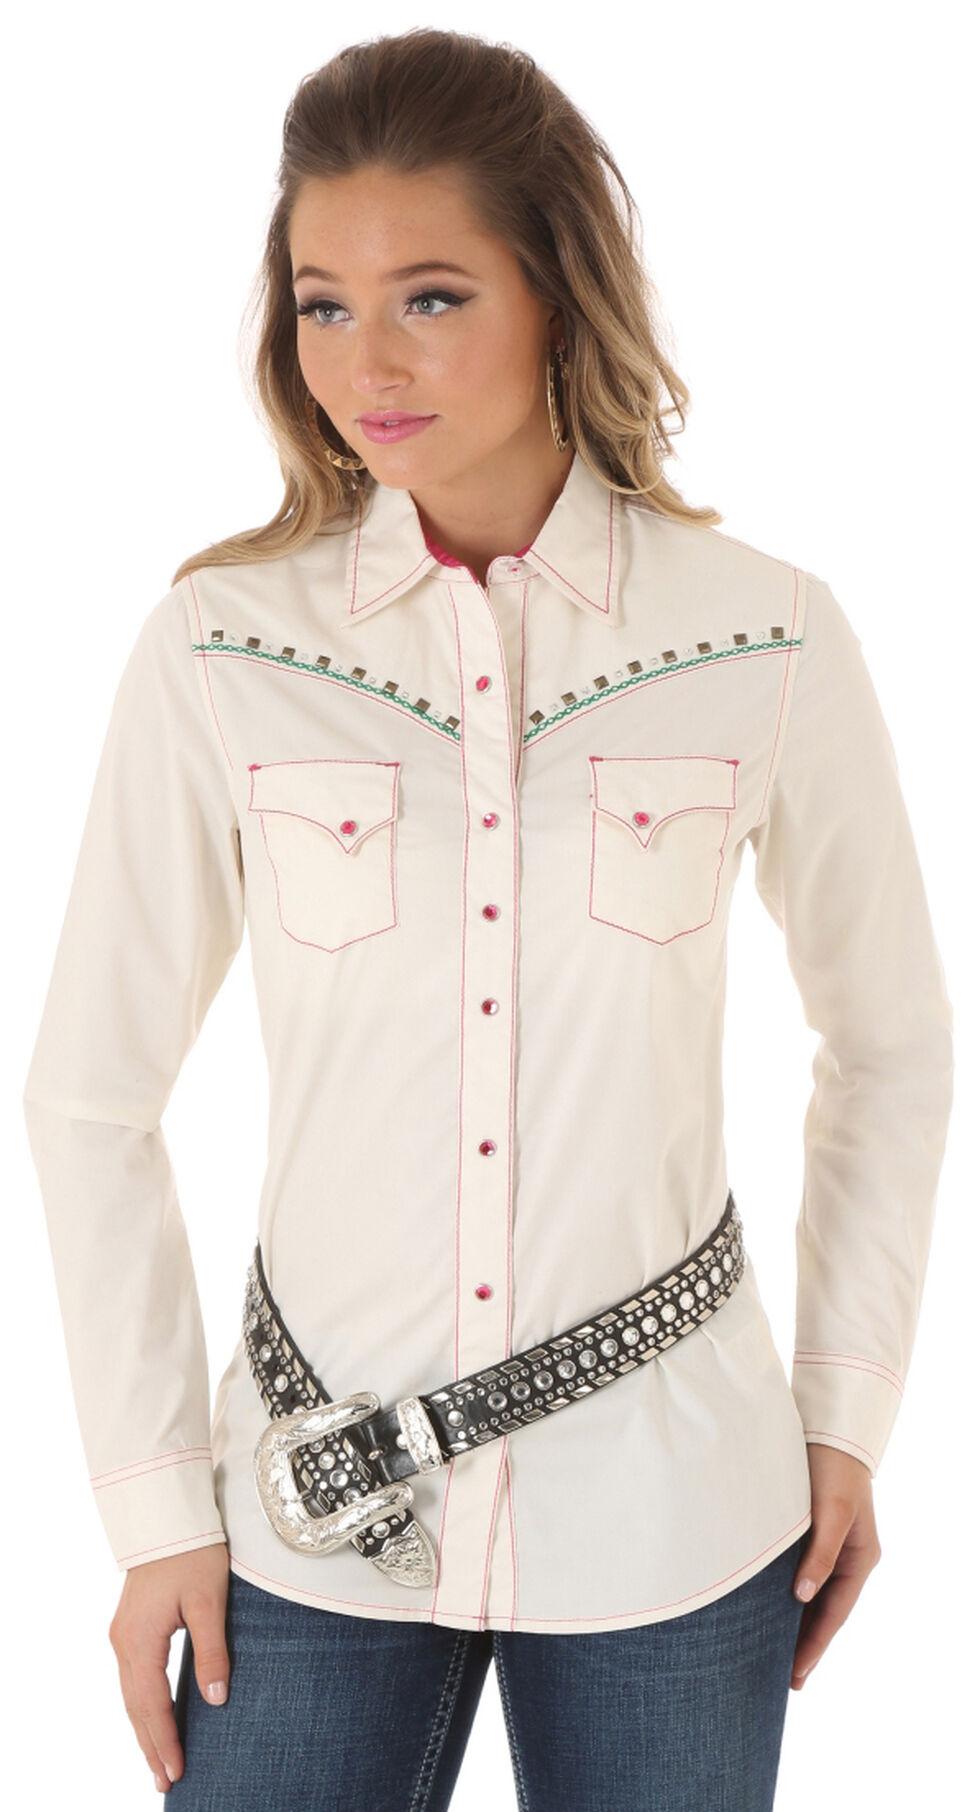 Wrangler Rock 47 Women's Heavy Stitch Snap Shirt, Cream, hi-res